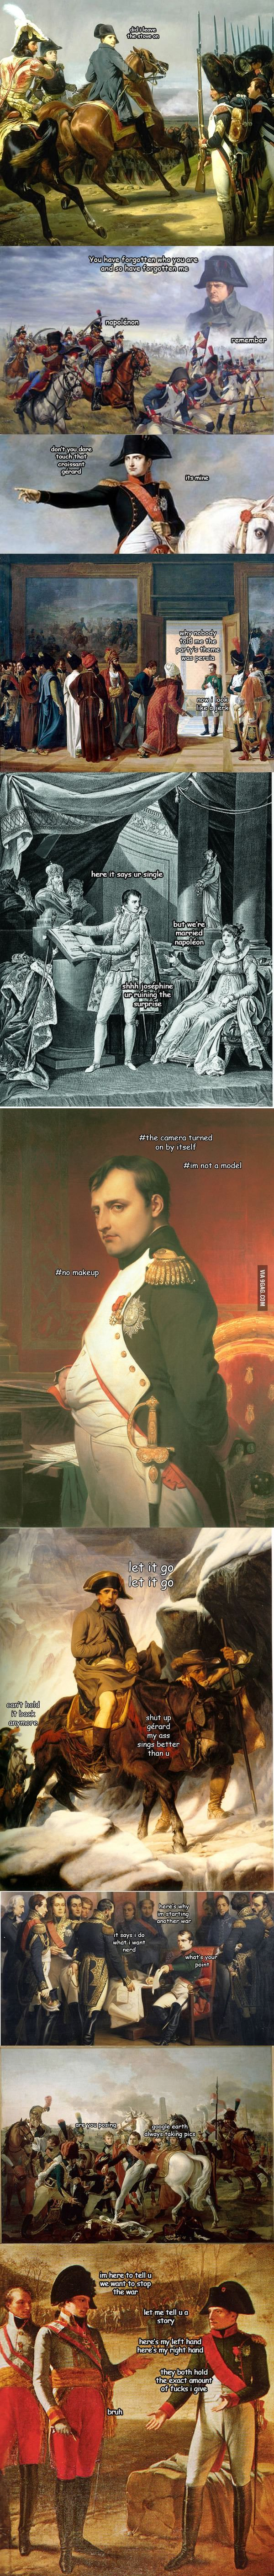 The Adventures of Napoléon Bonaparte